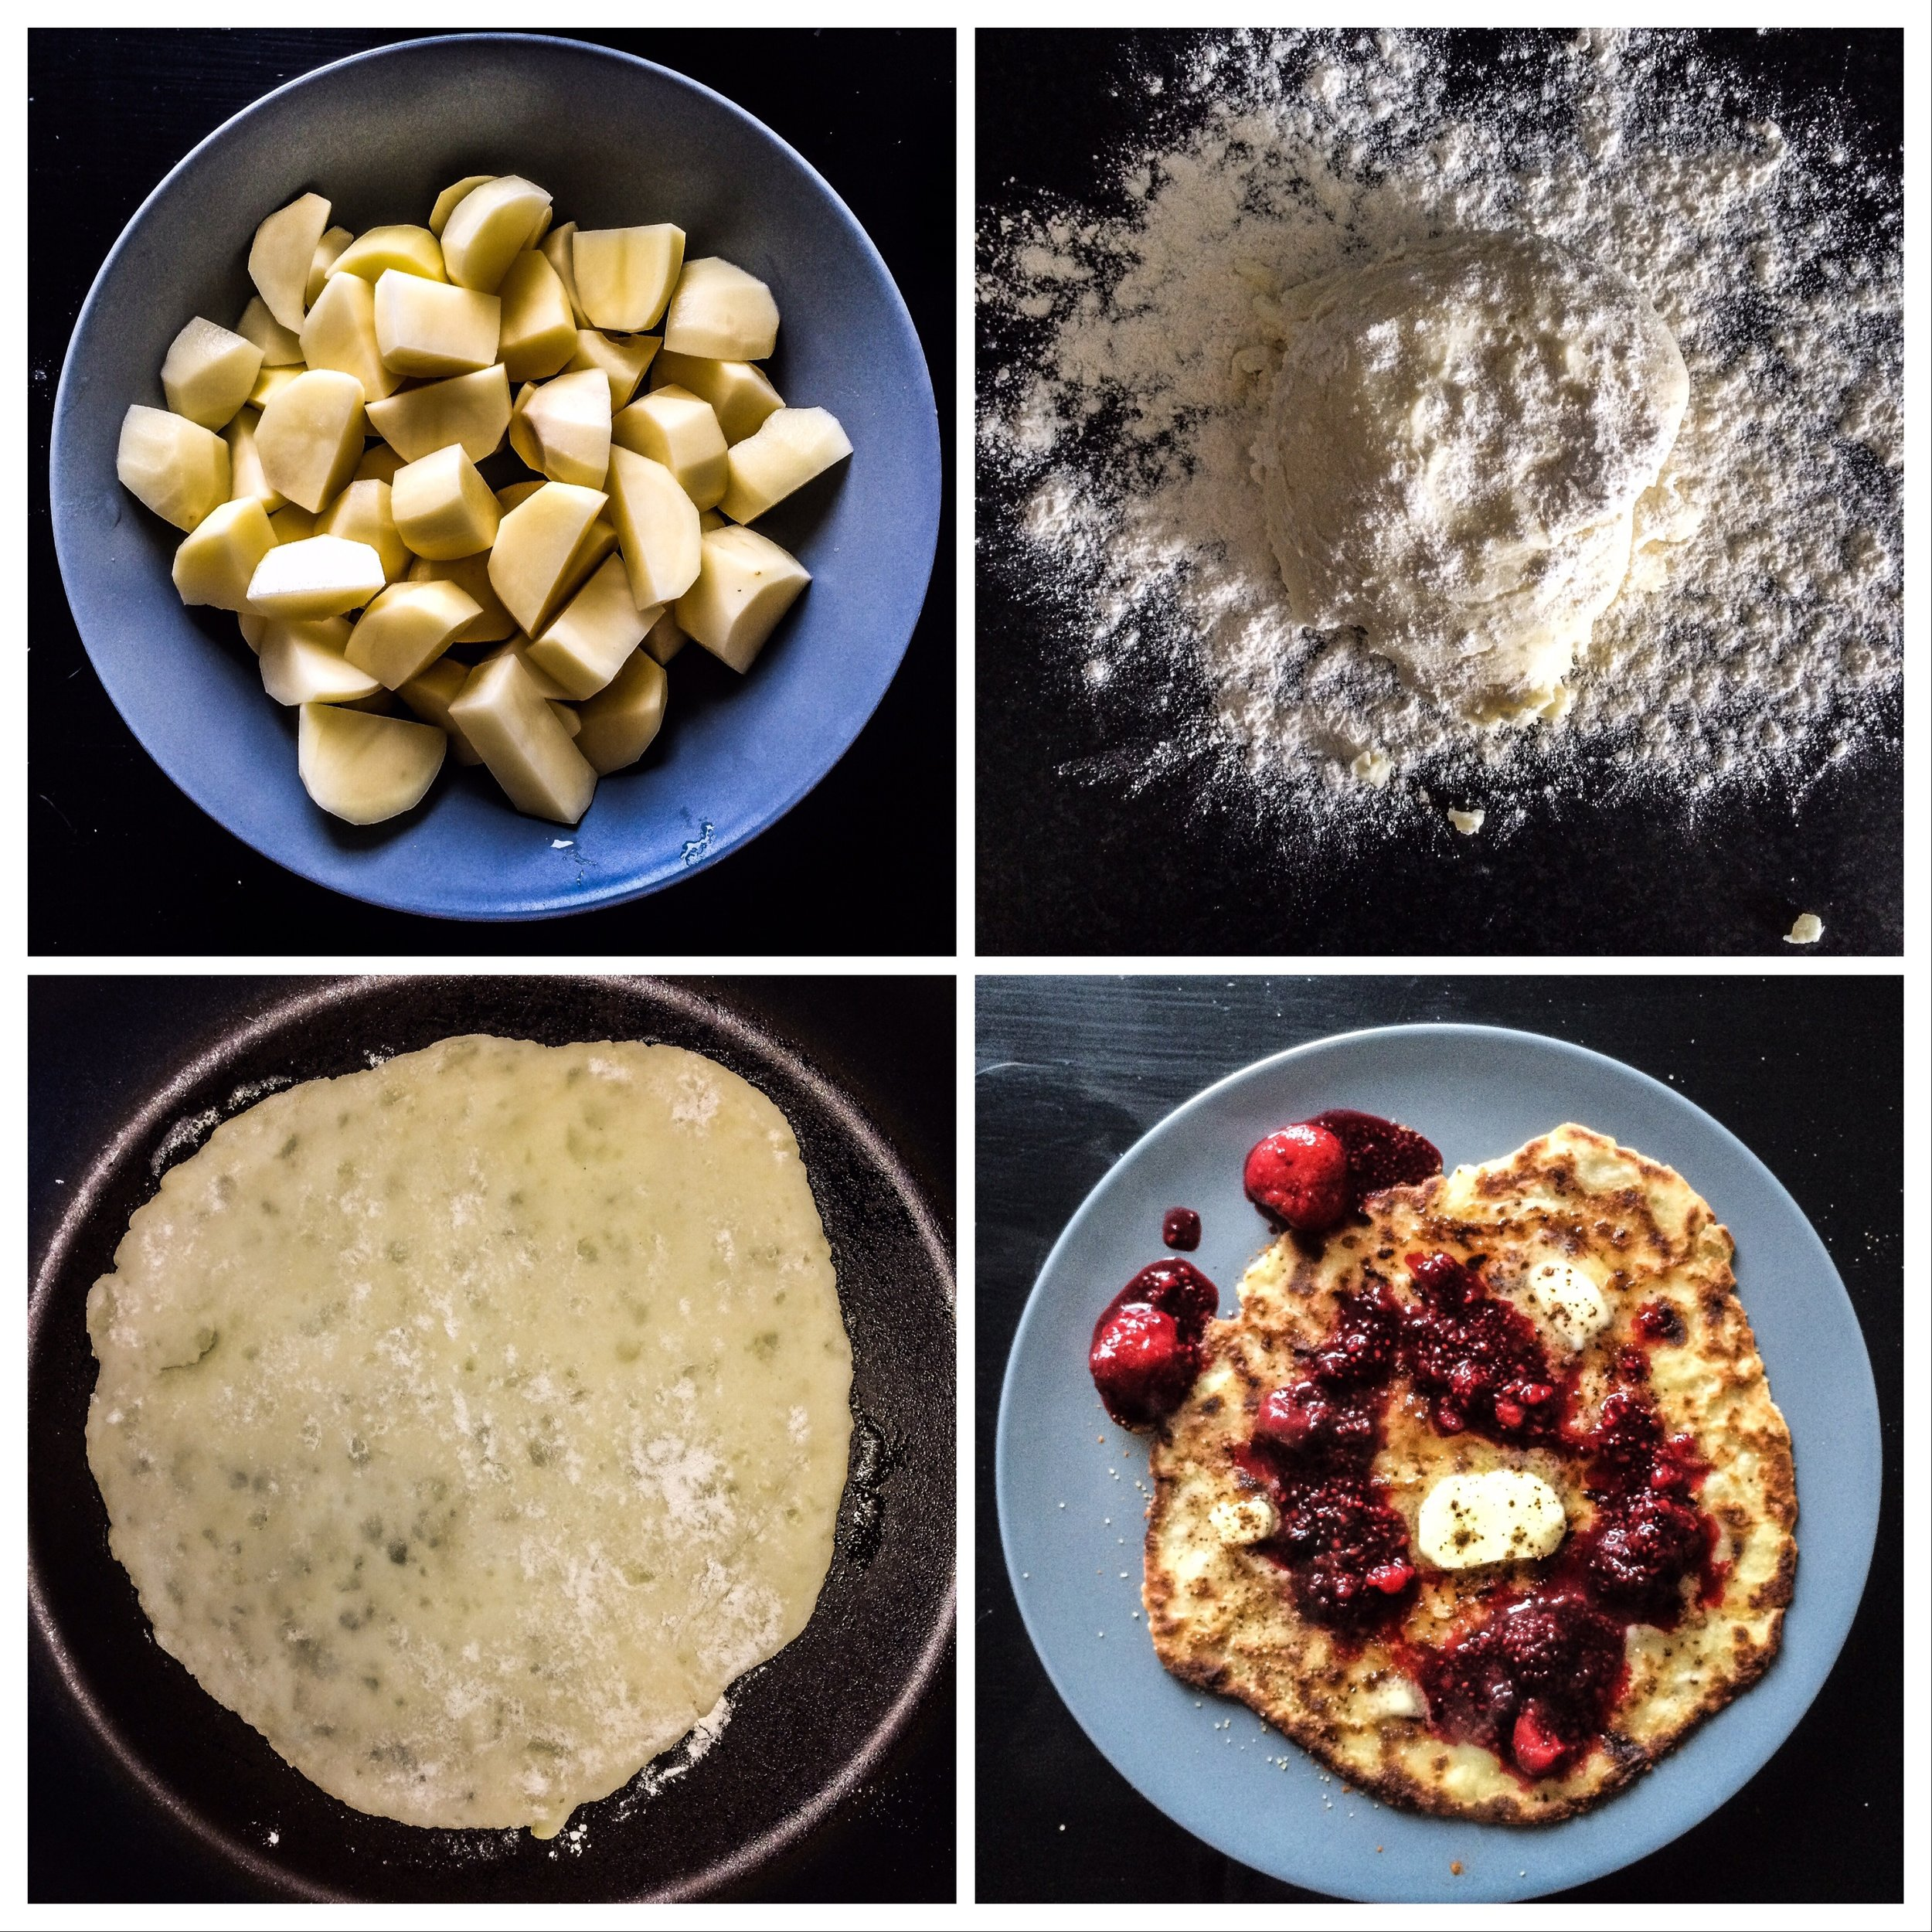 from a potato to a pancake